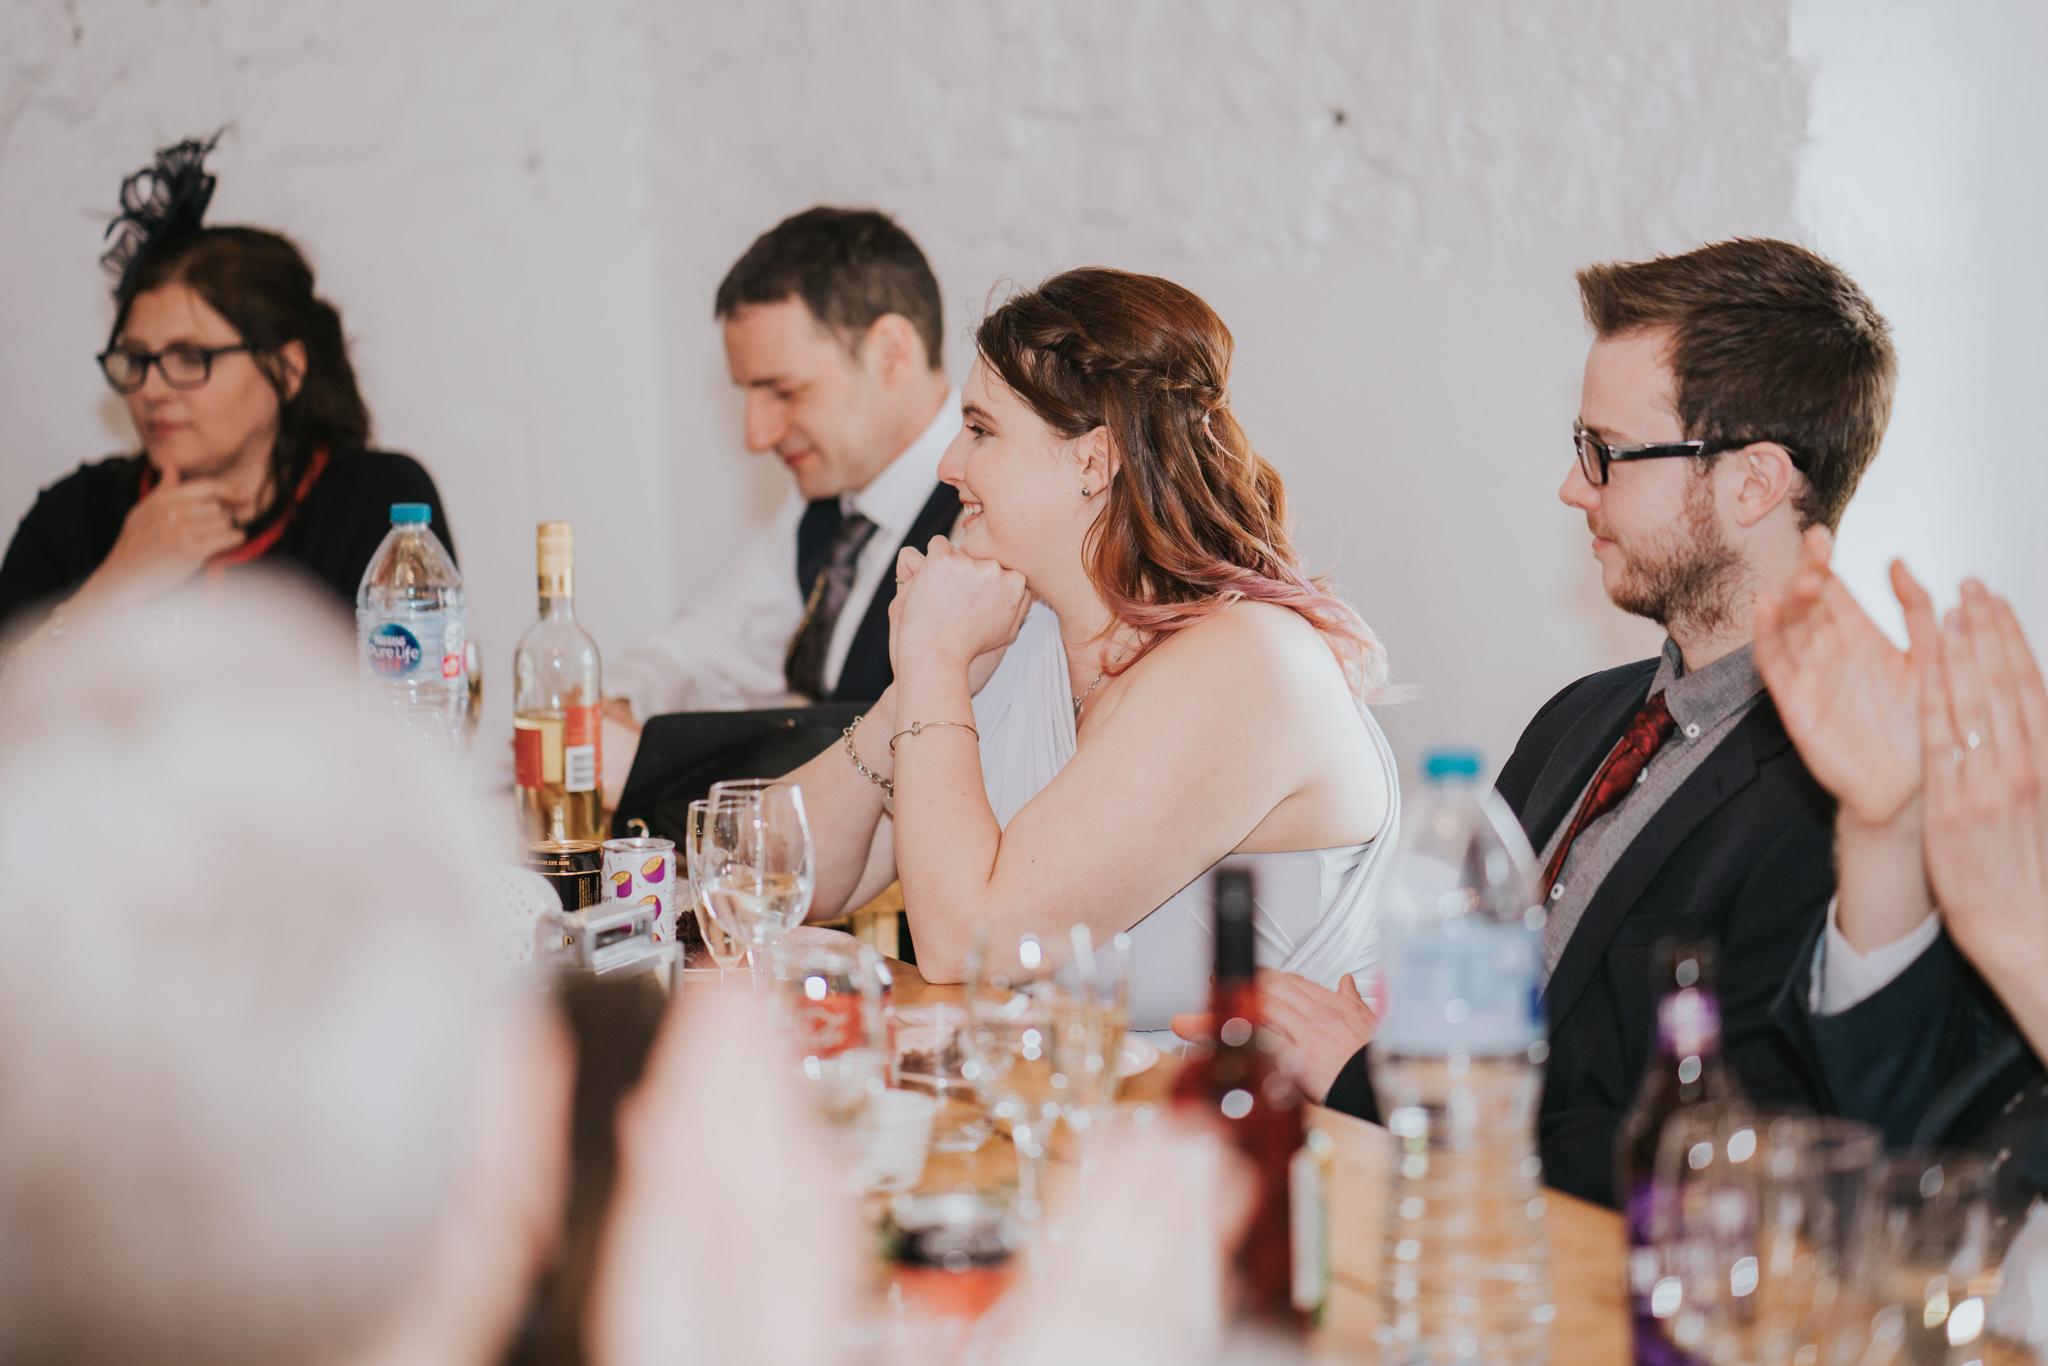 grace-sam-old-barn-clovelly-devon-wedding-photographer-grace-elizabeth-essex-suffolk-norfolk-wedding-photographer (86 of 132).jpg